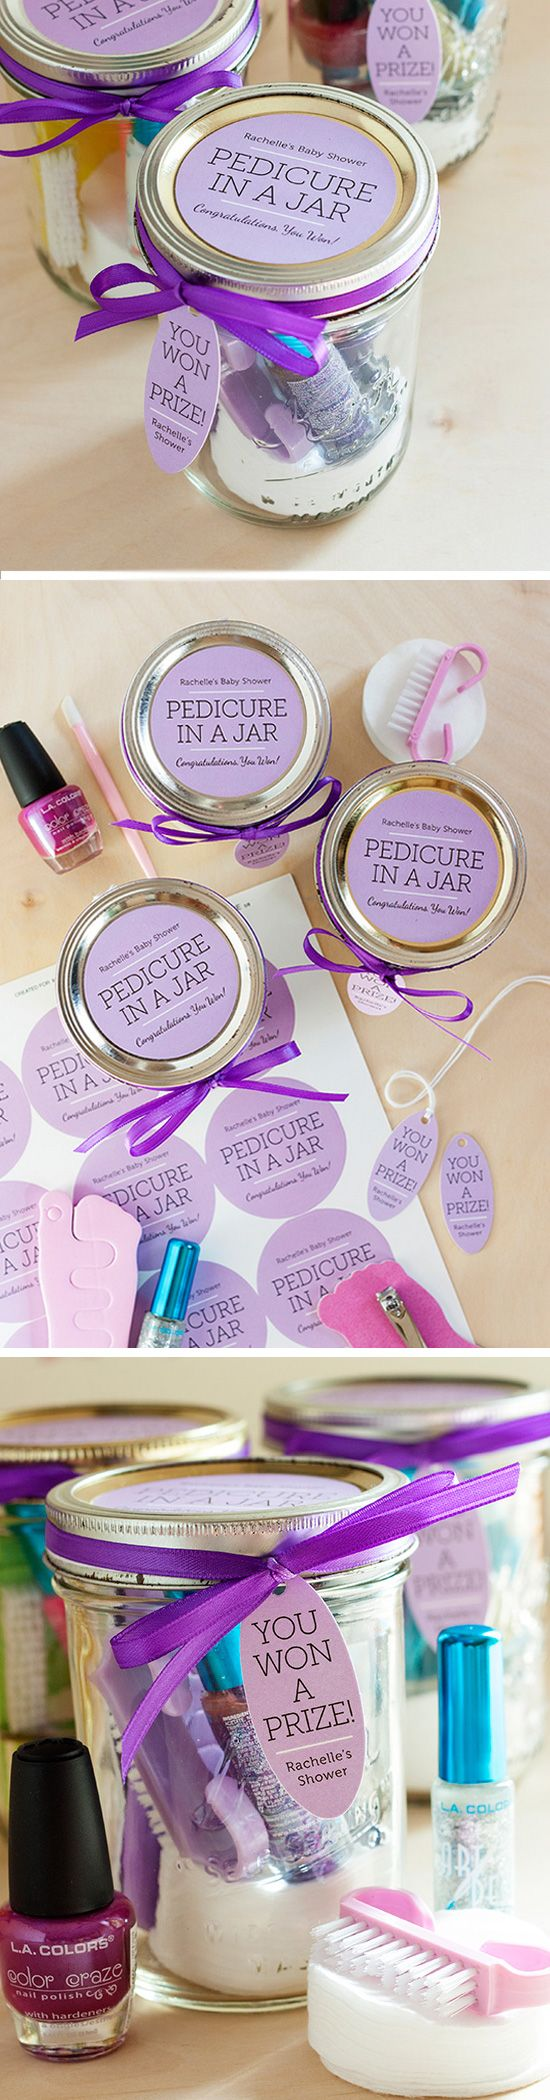 Pedicure in a Jar | Click Pic for 22 DIY Valentine Gifts in a Jar for Men | DIY Valentine Gifts for Friends